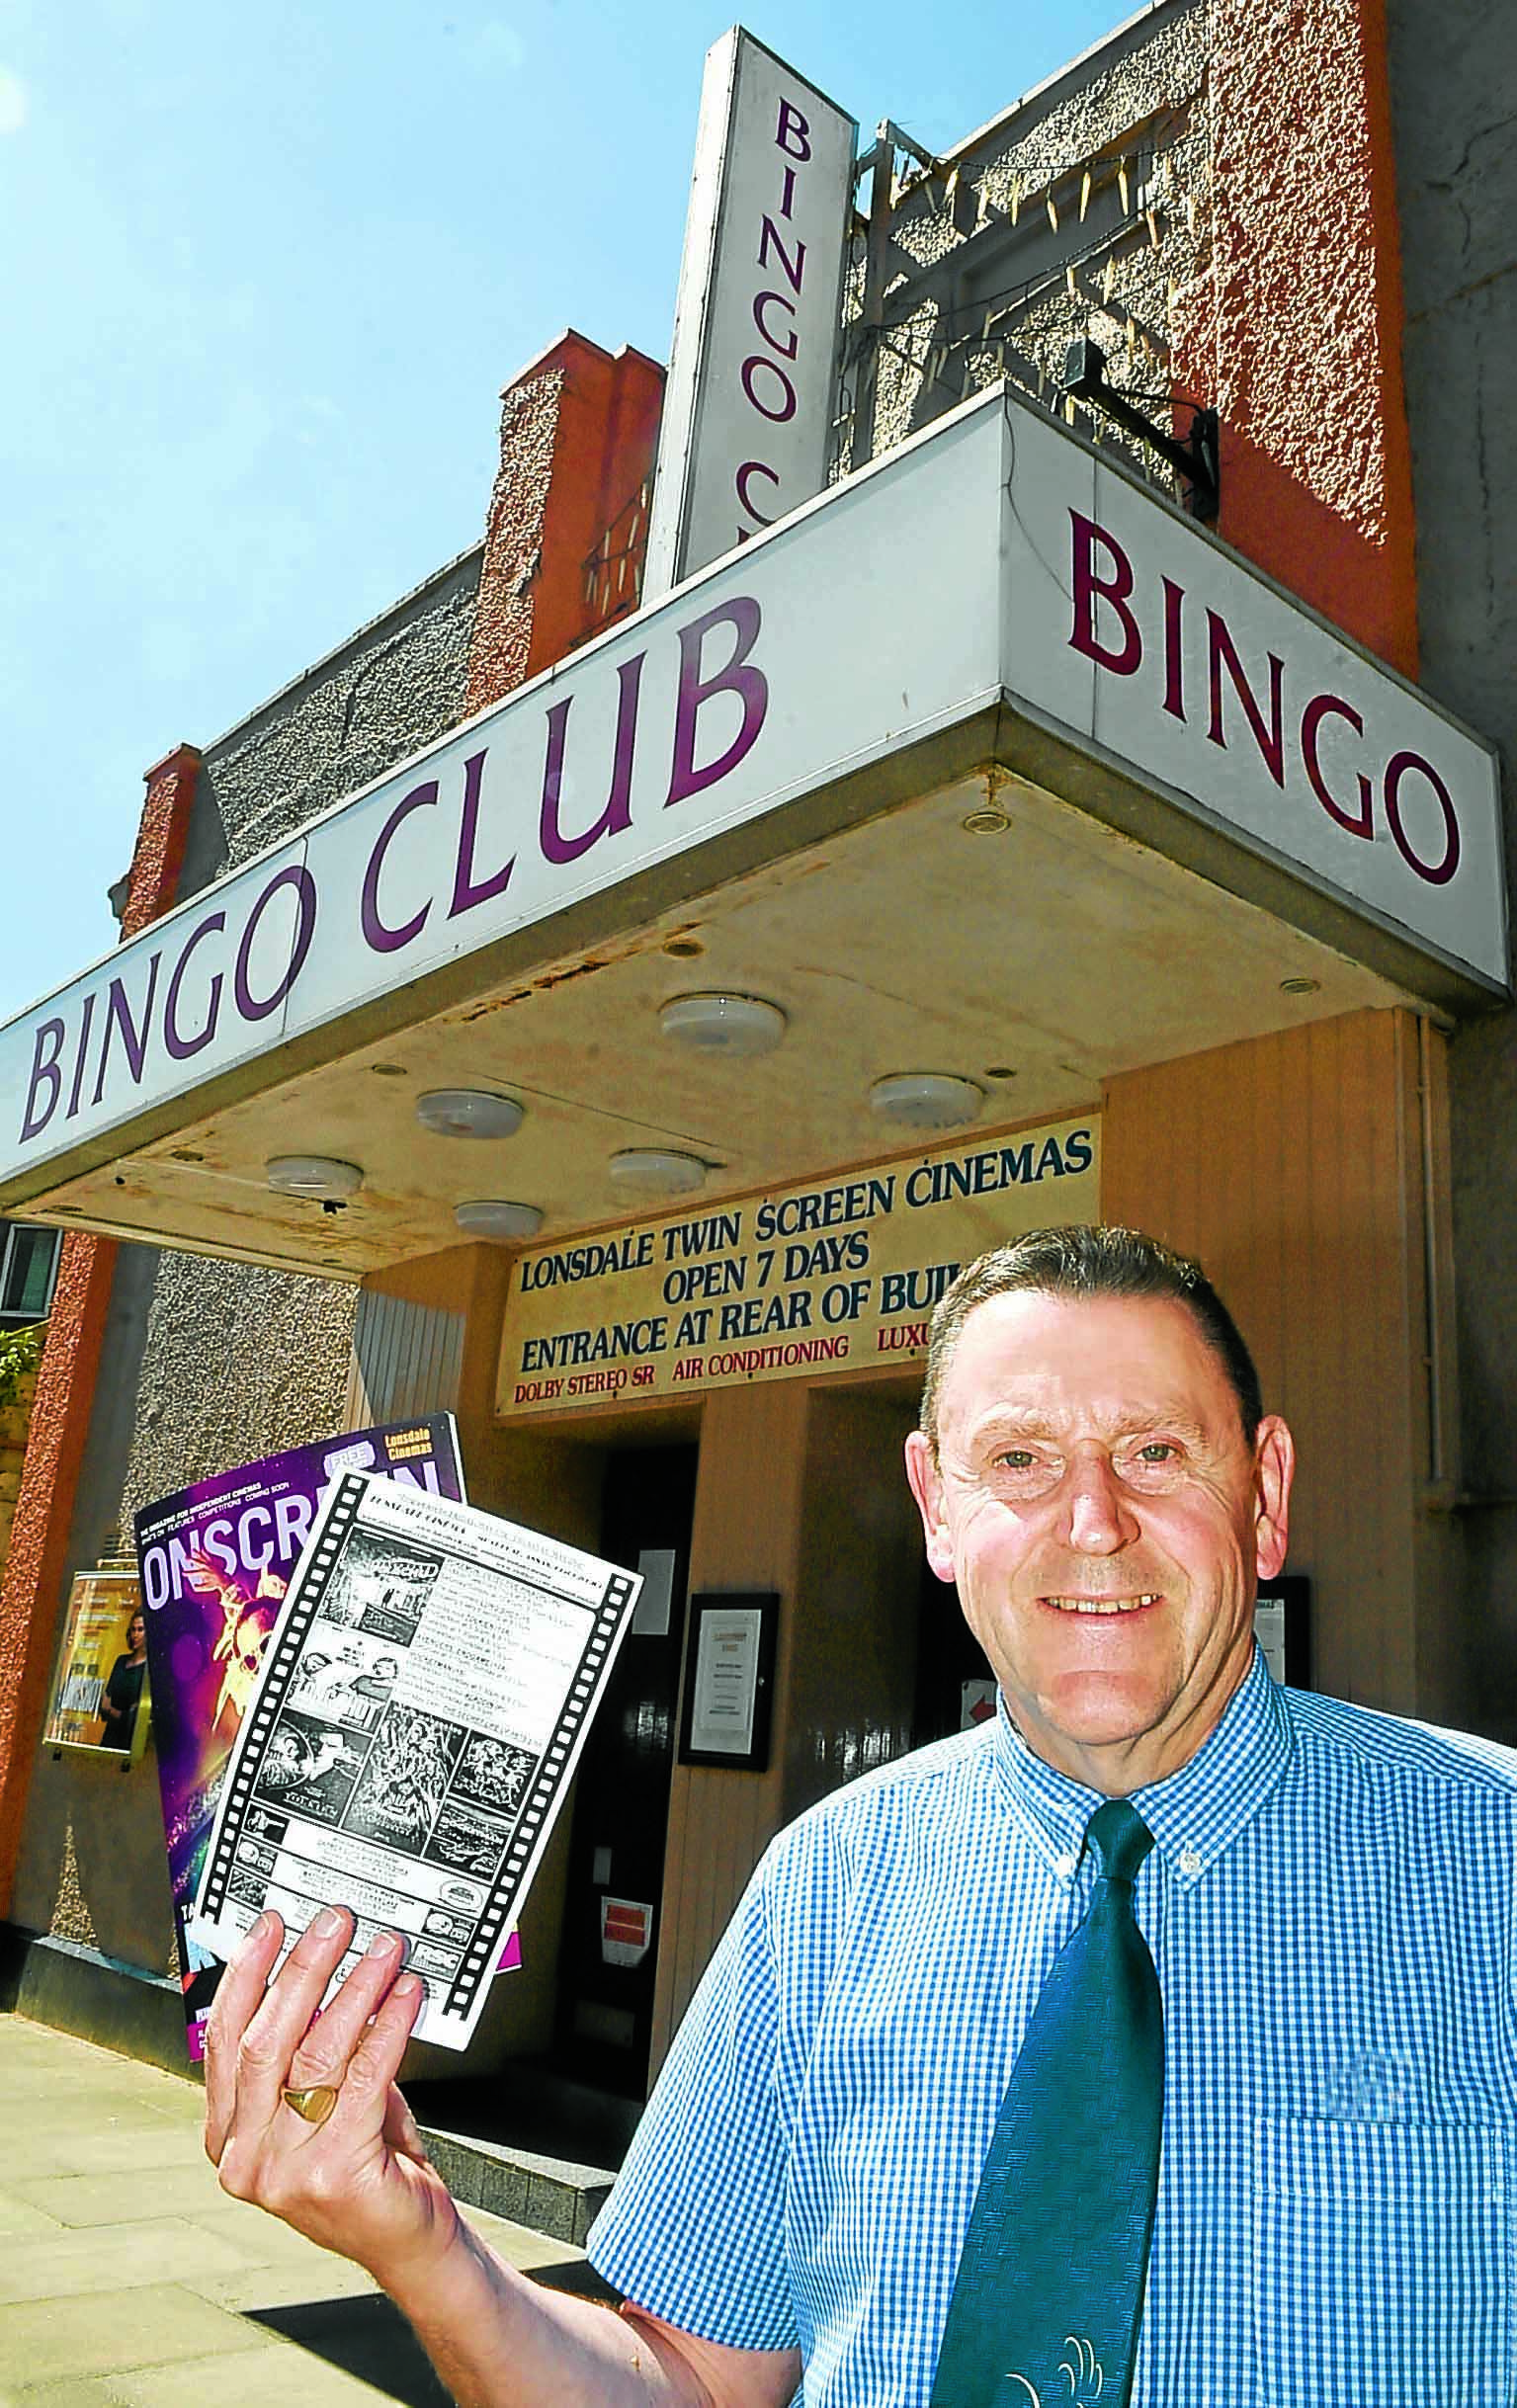 Bye bye bingo